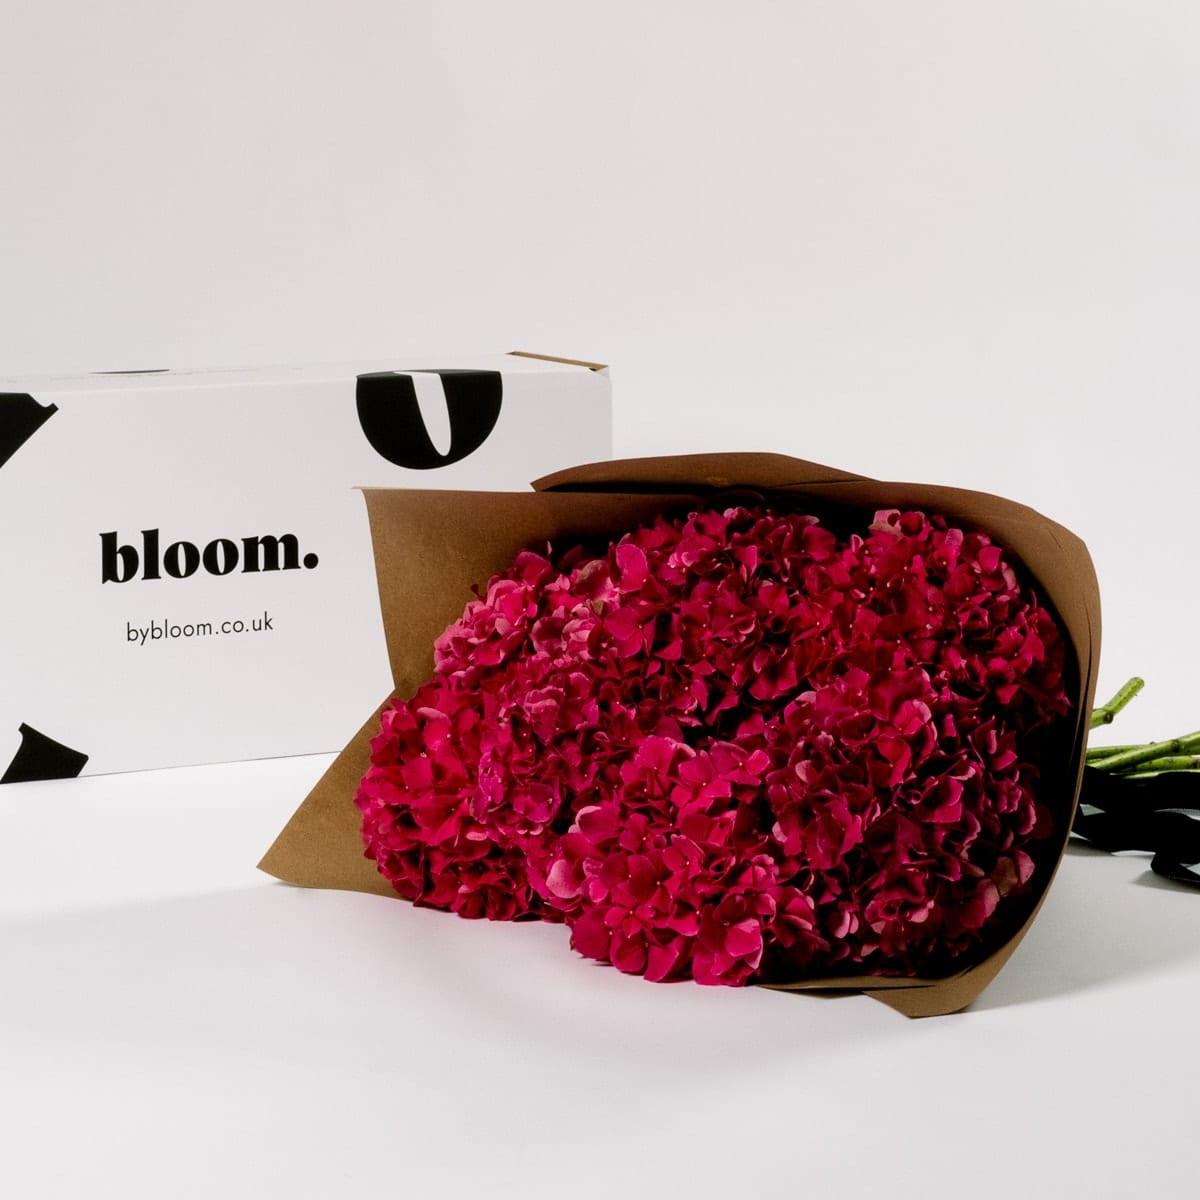 Bloom Flower Delivery | Raspberry Red Hydrangea